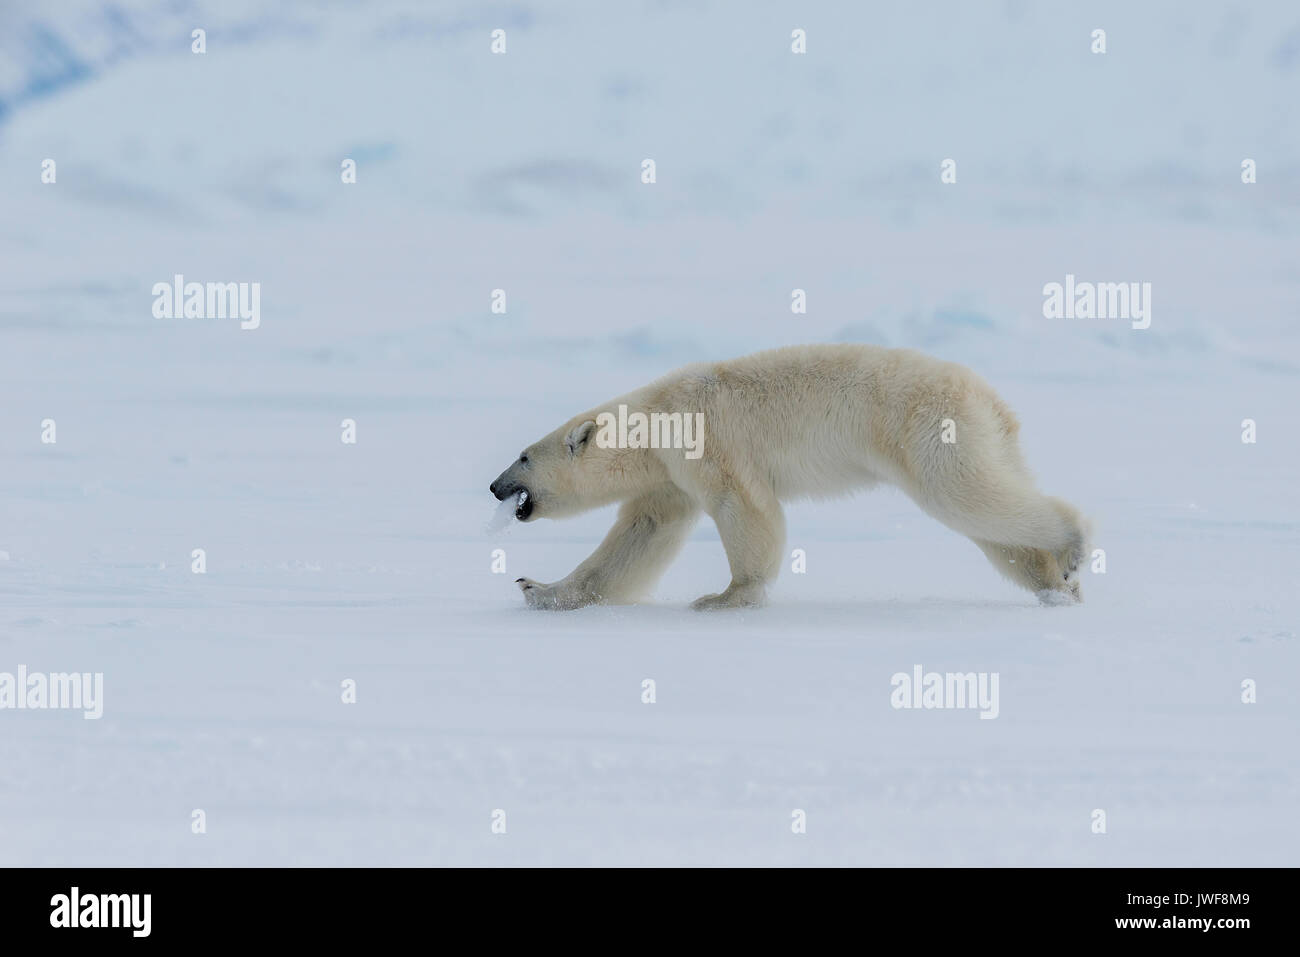 Male polar bear running along the frozen surface of Lancaster Sound, Baffin Island, Canada. Stock Photo